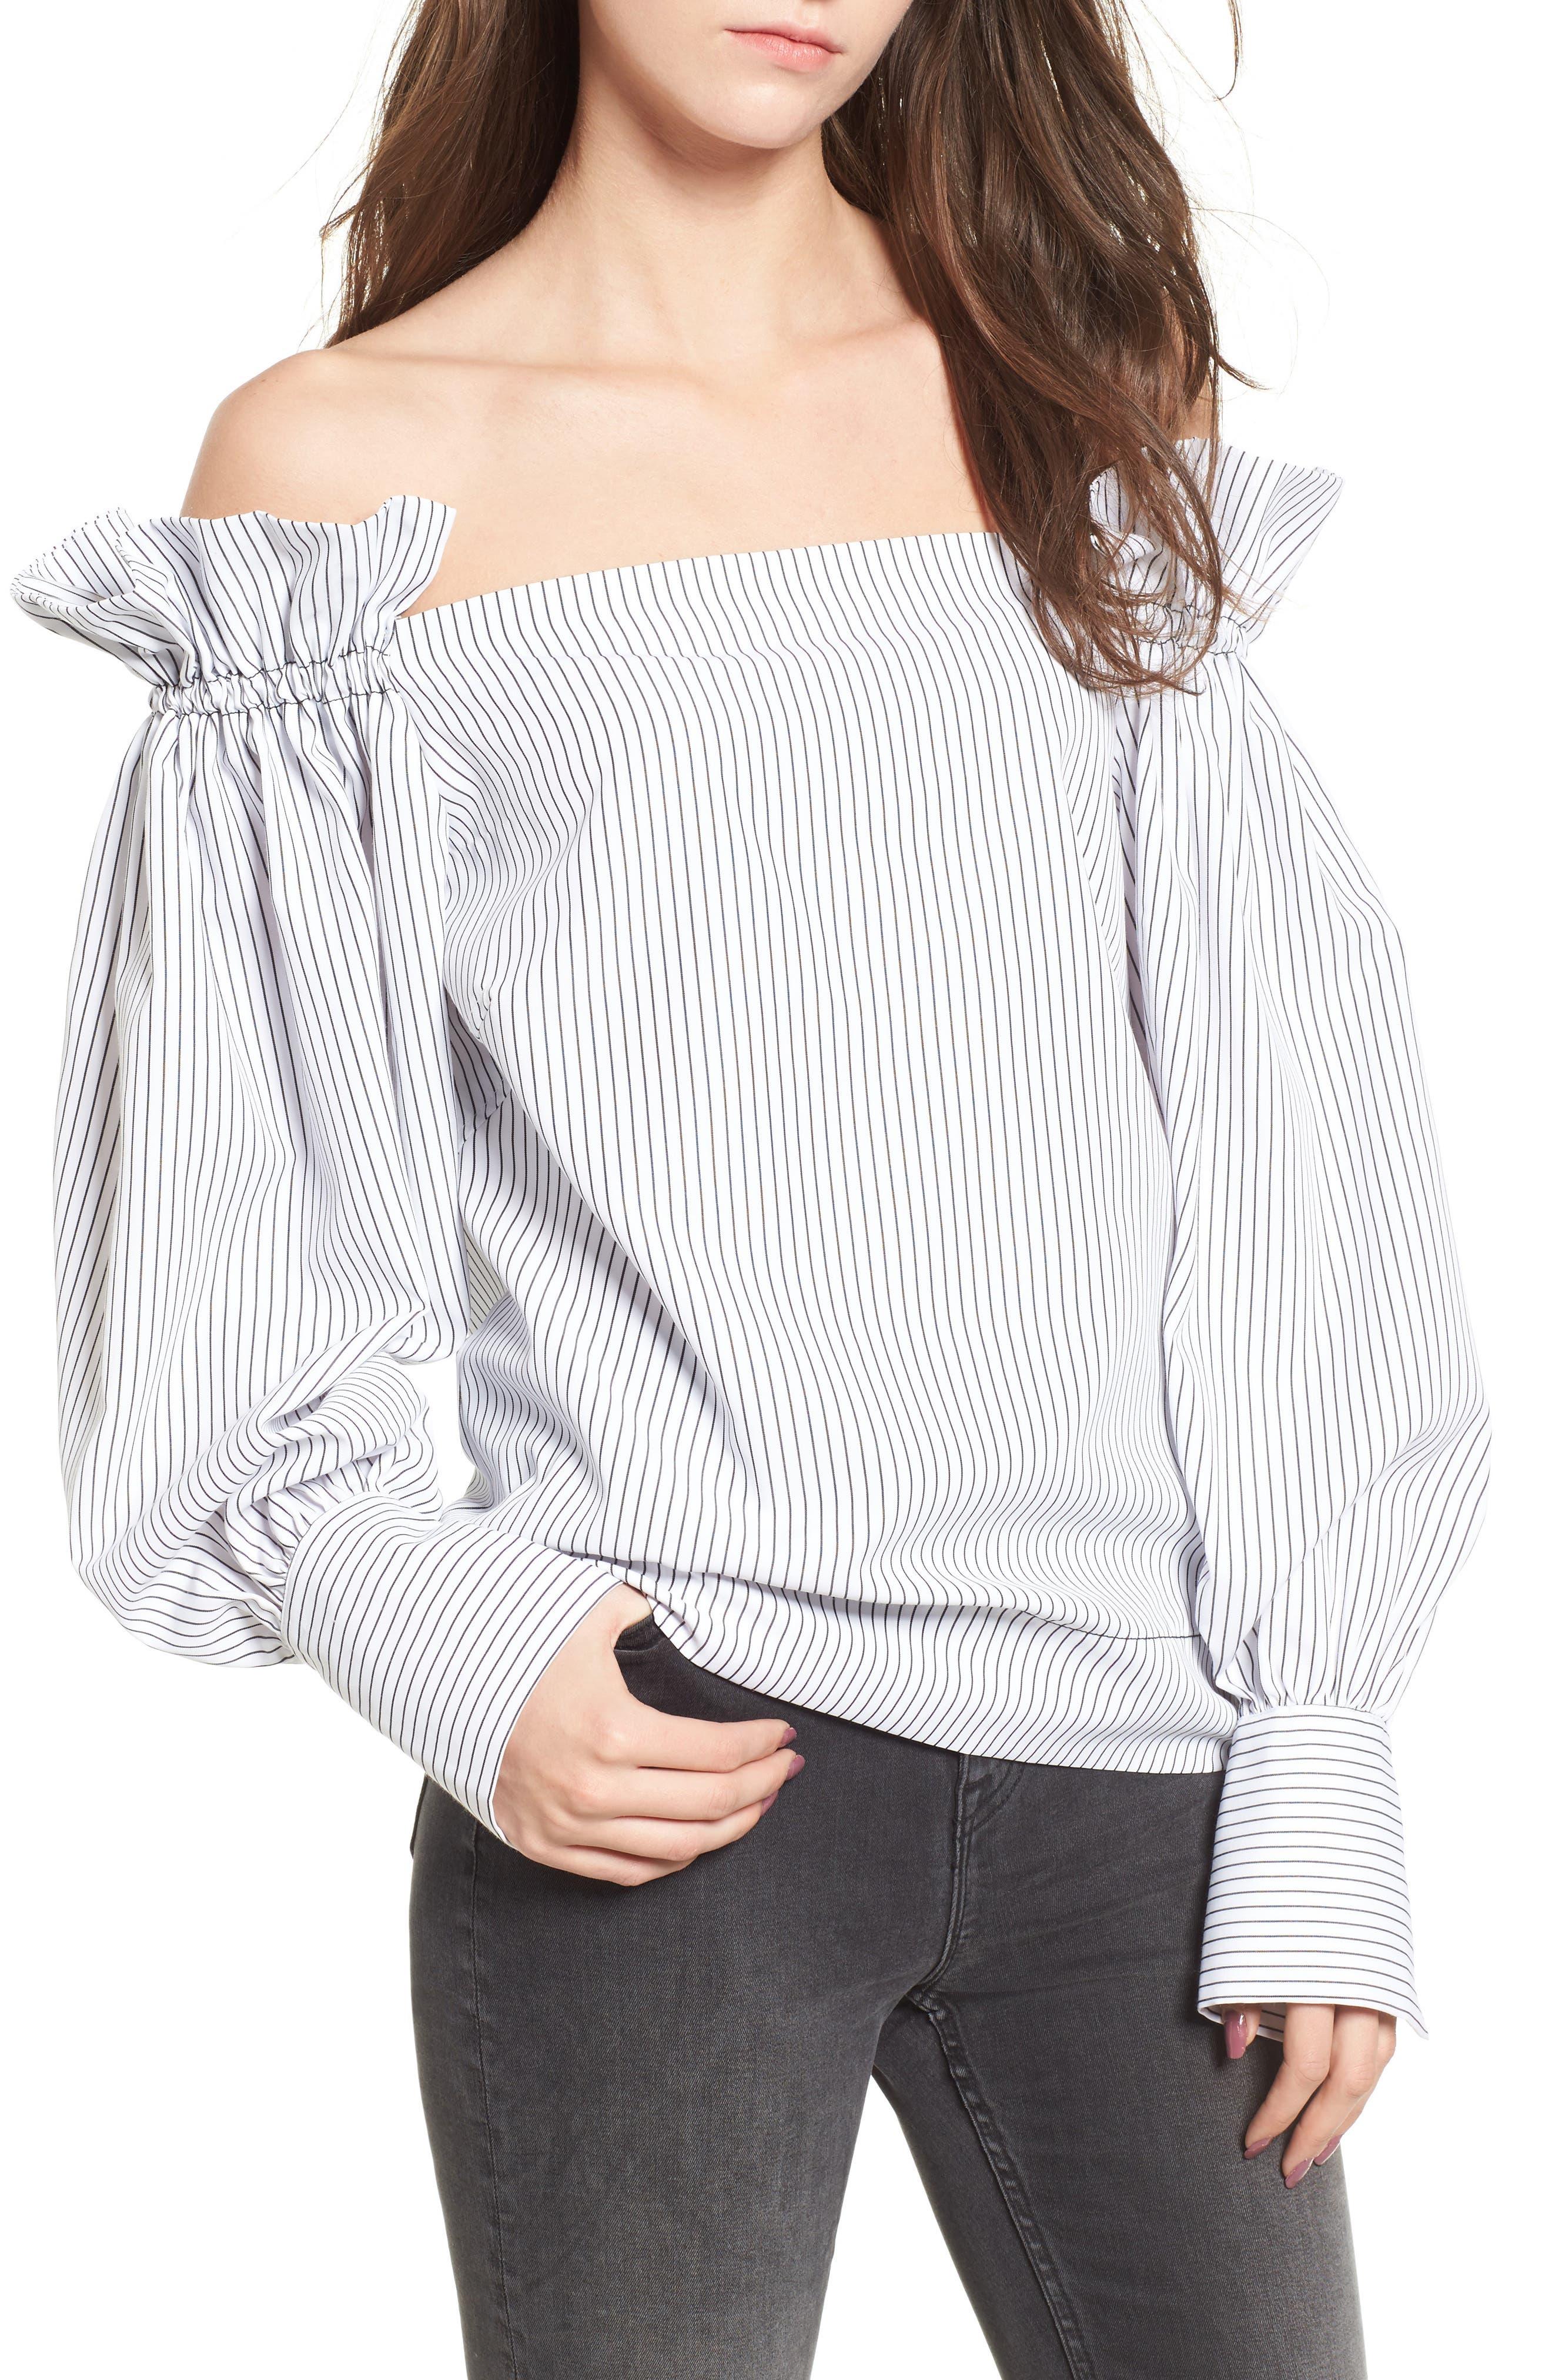 Lea & Viola Ruffle Off the Shoulder Top,                         Main,                         color, White/ Black